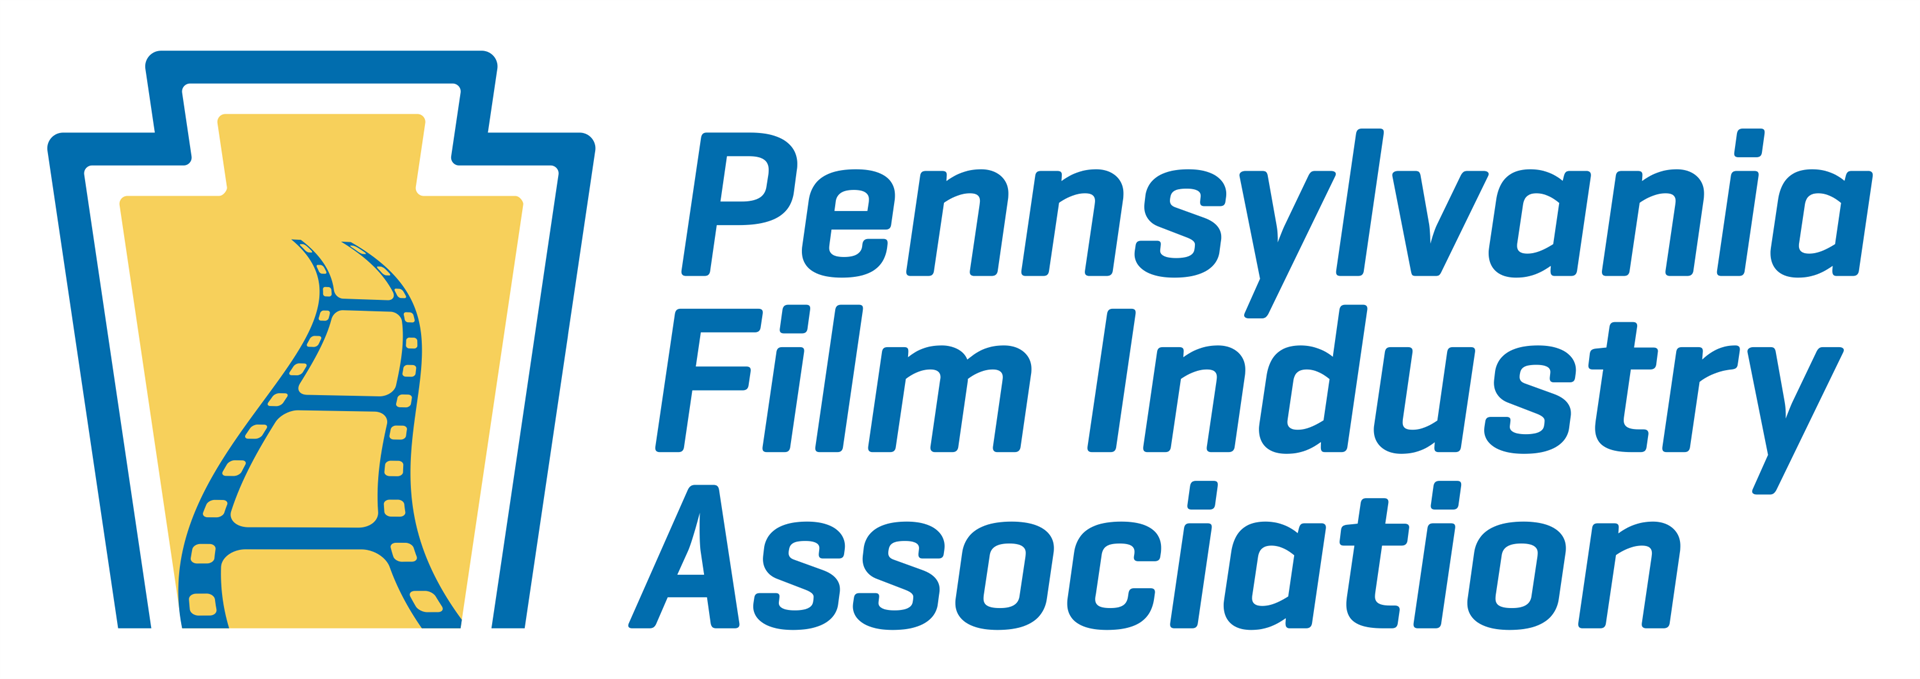 Pennsylvania Film Industry Association Home